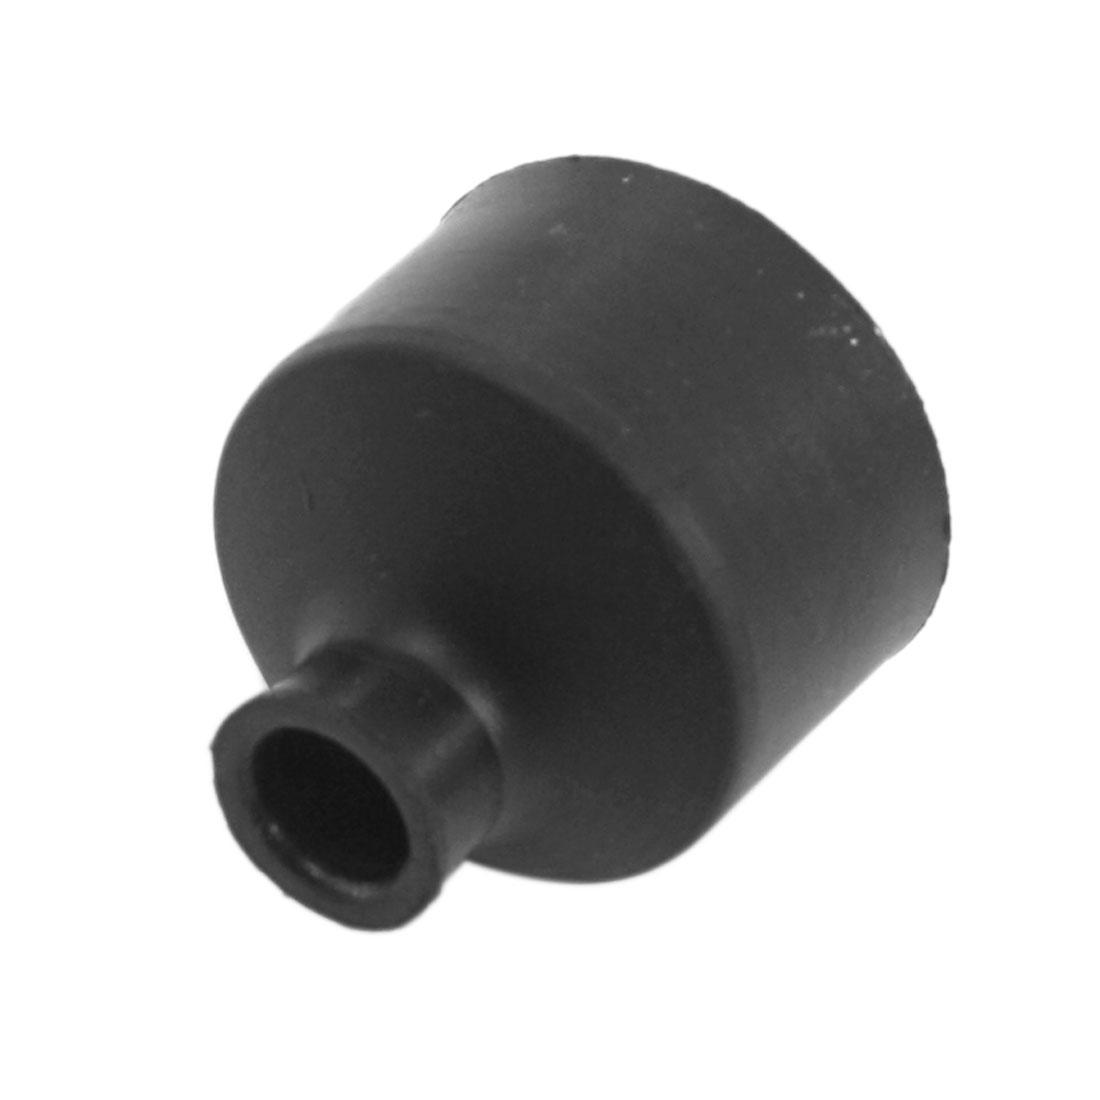 02028 Black Rubber Air Filter w Beige Sponge for RC 1/10 Model Cars